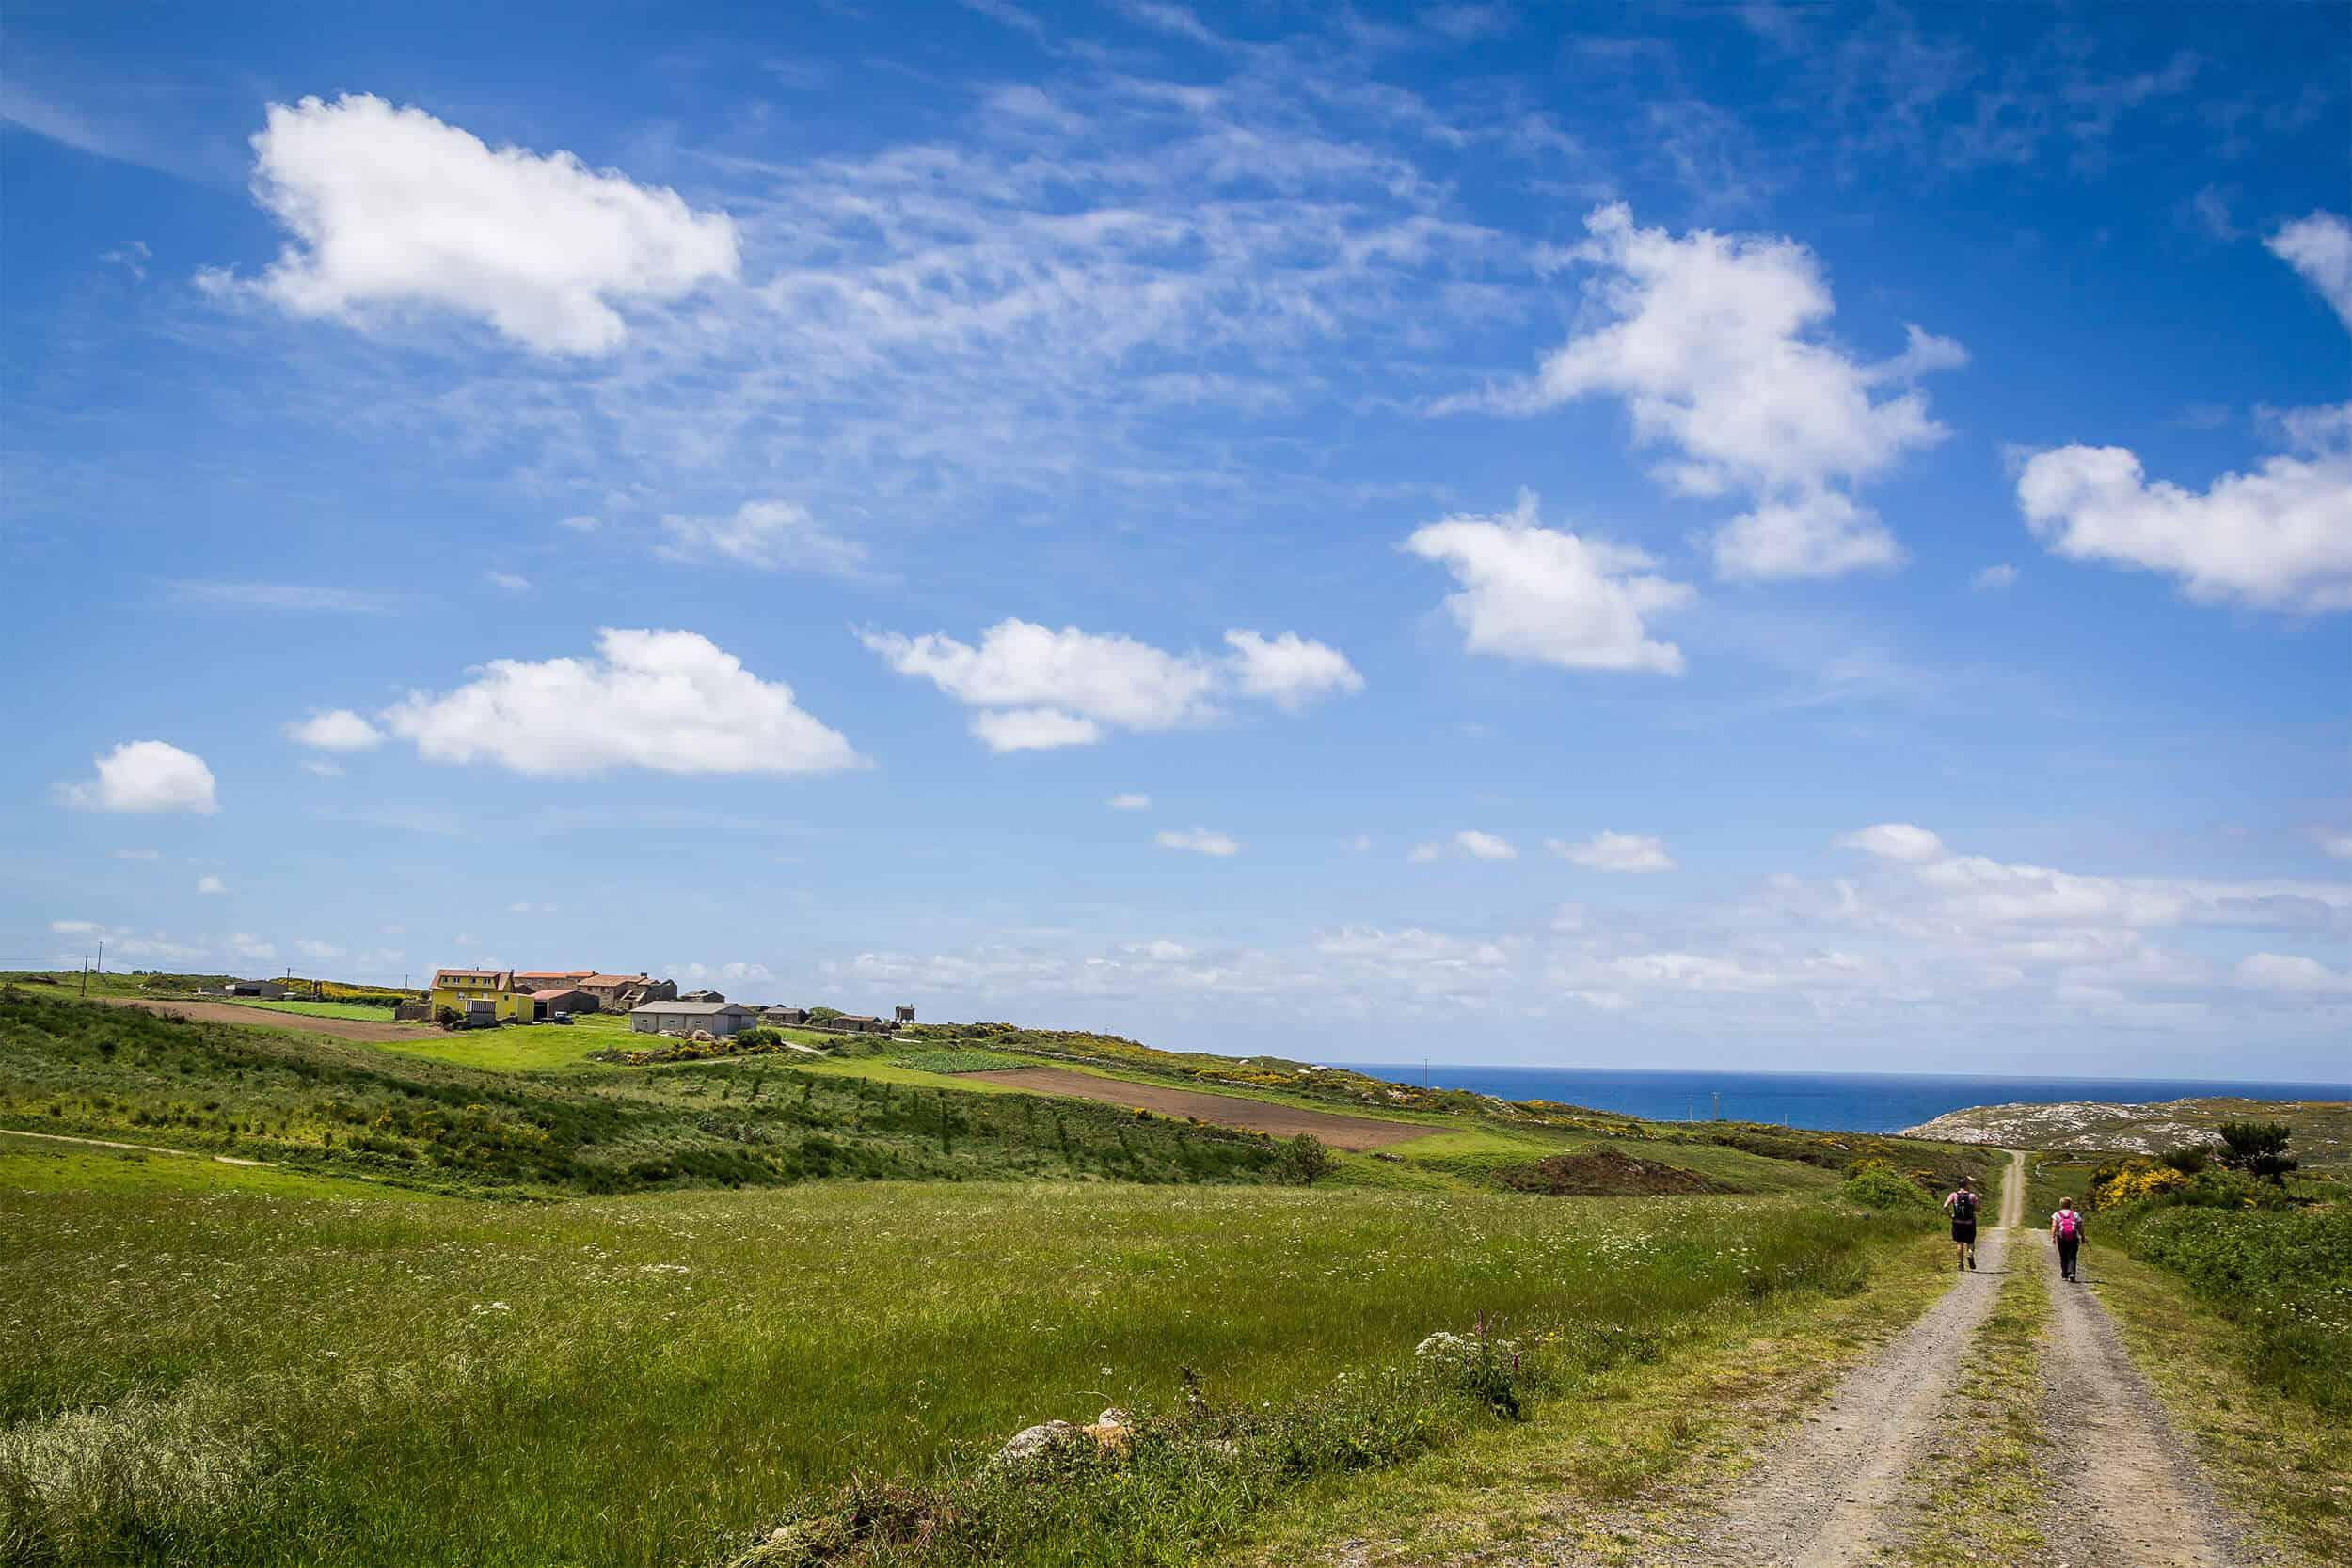 Pilgrim walking camino finisterra - end of the world toward sea